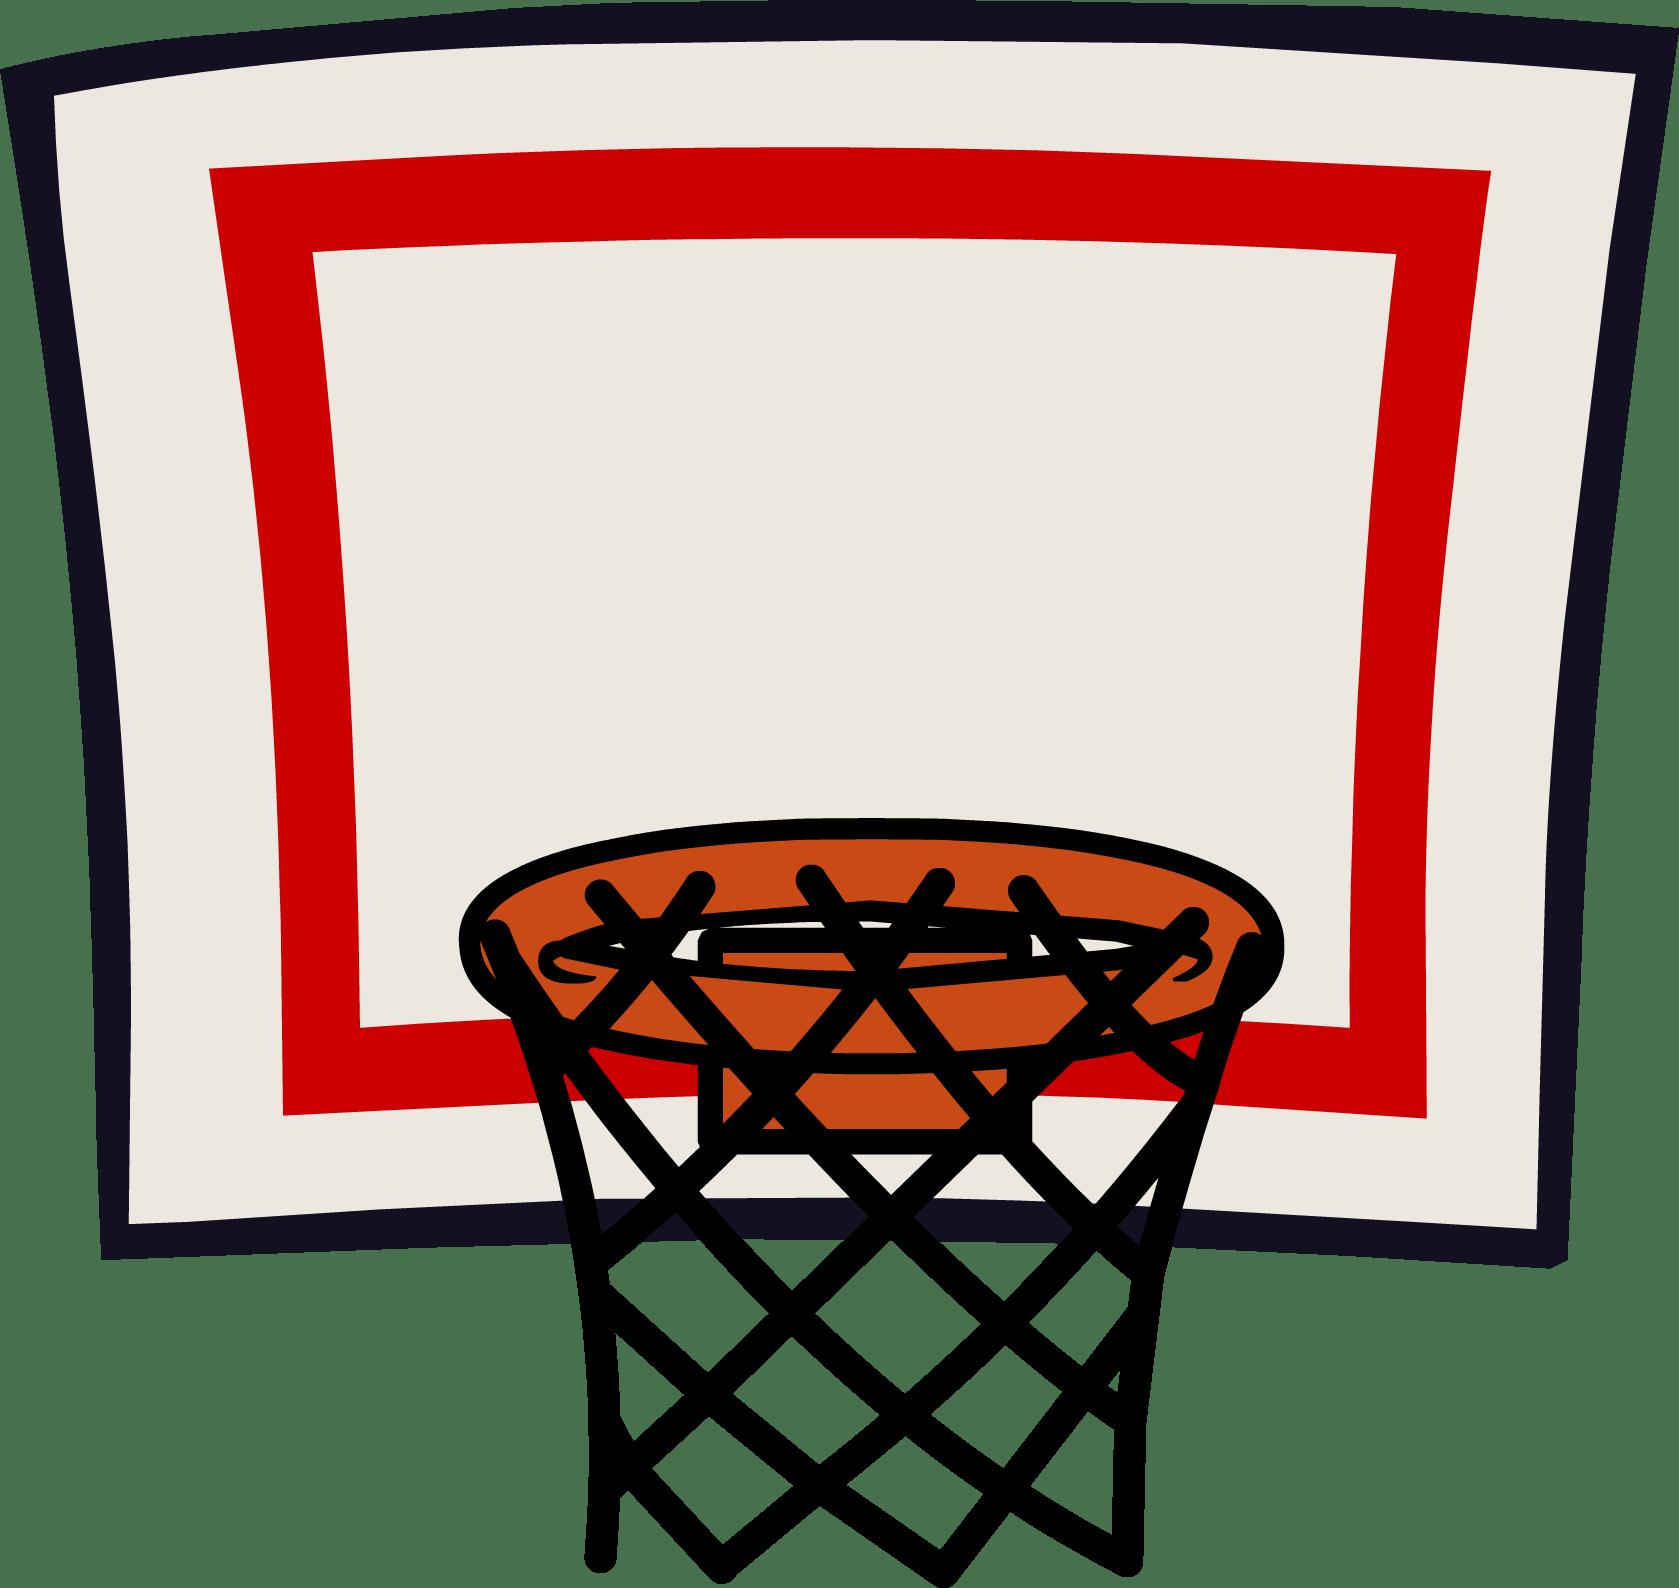 1679x1588 Basketball Hoop Transparent Png